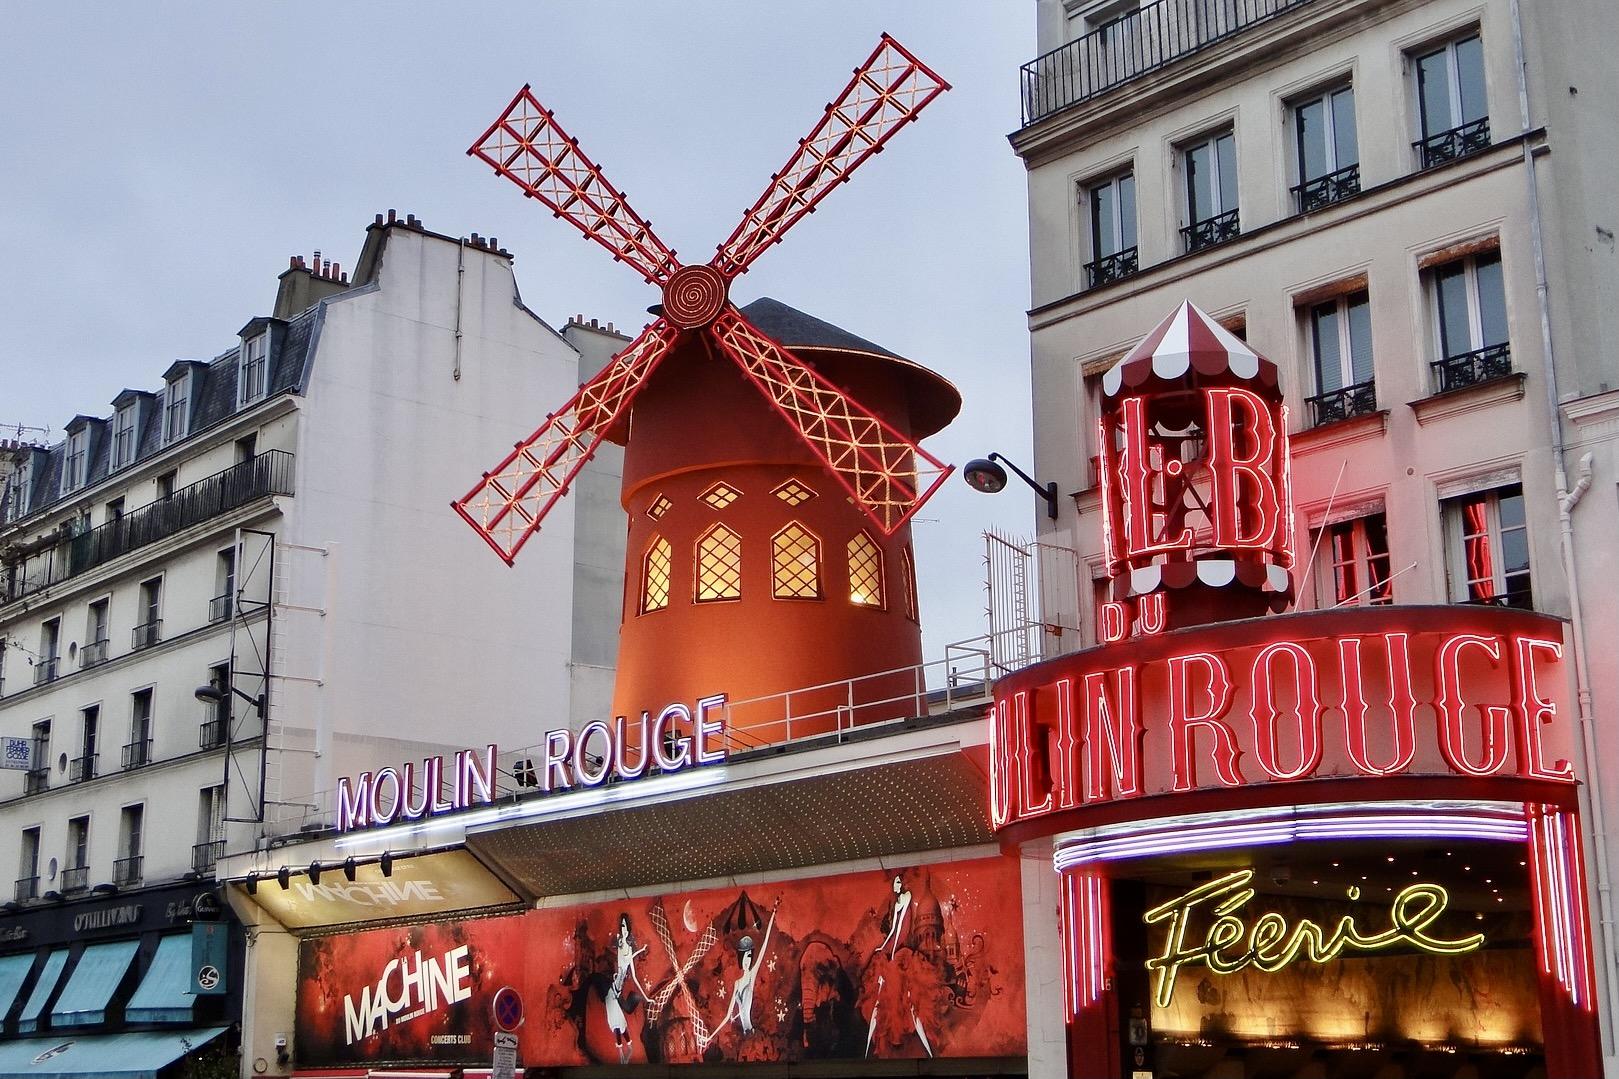 Moulin Rouge in Paris